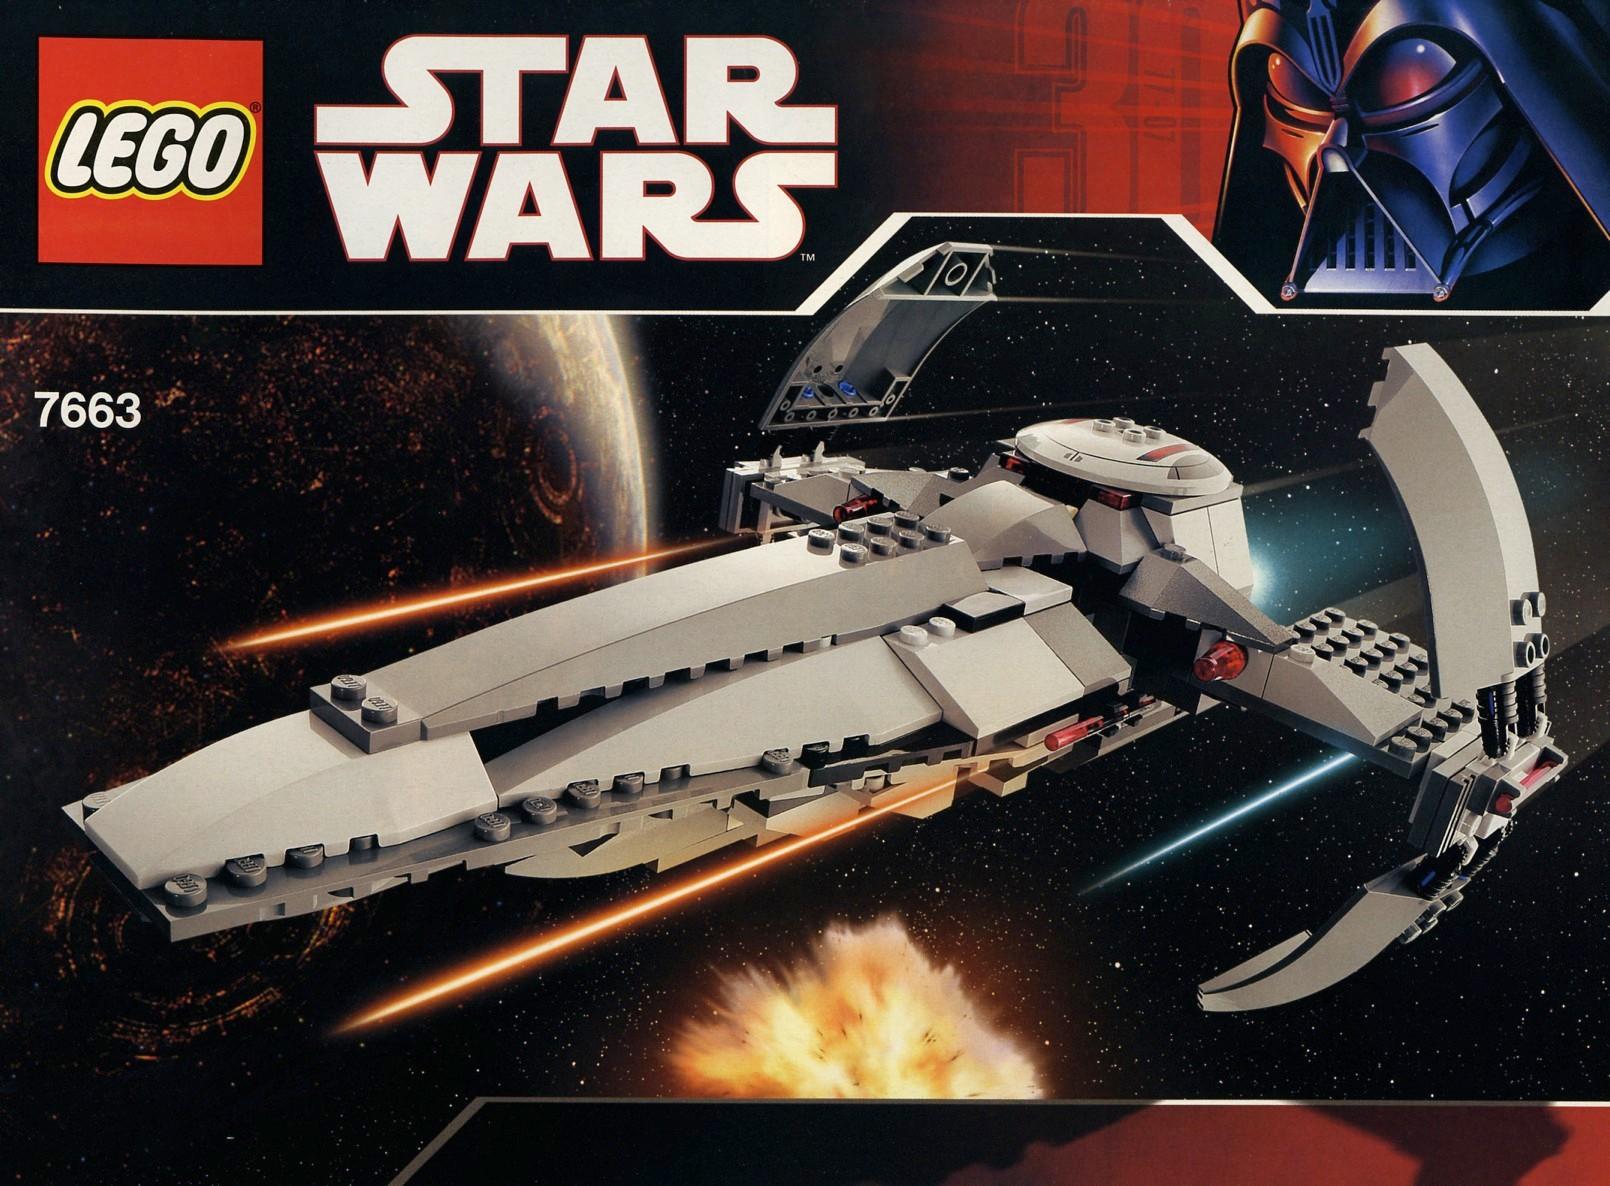 Star Wars 2007 Brickset Lego Set Guide And Database